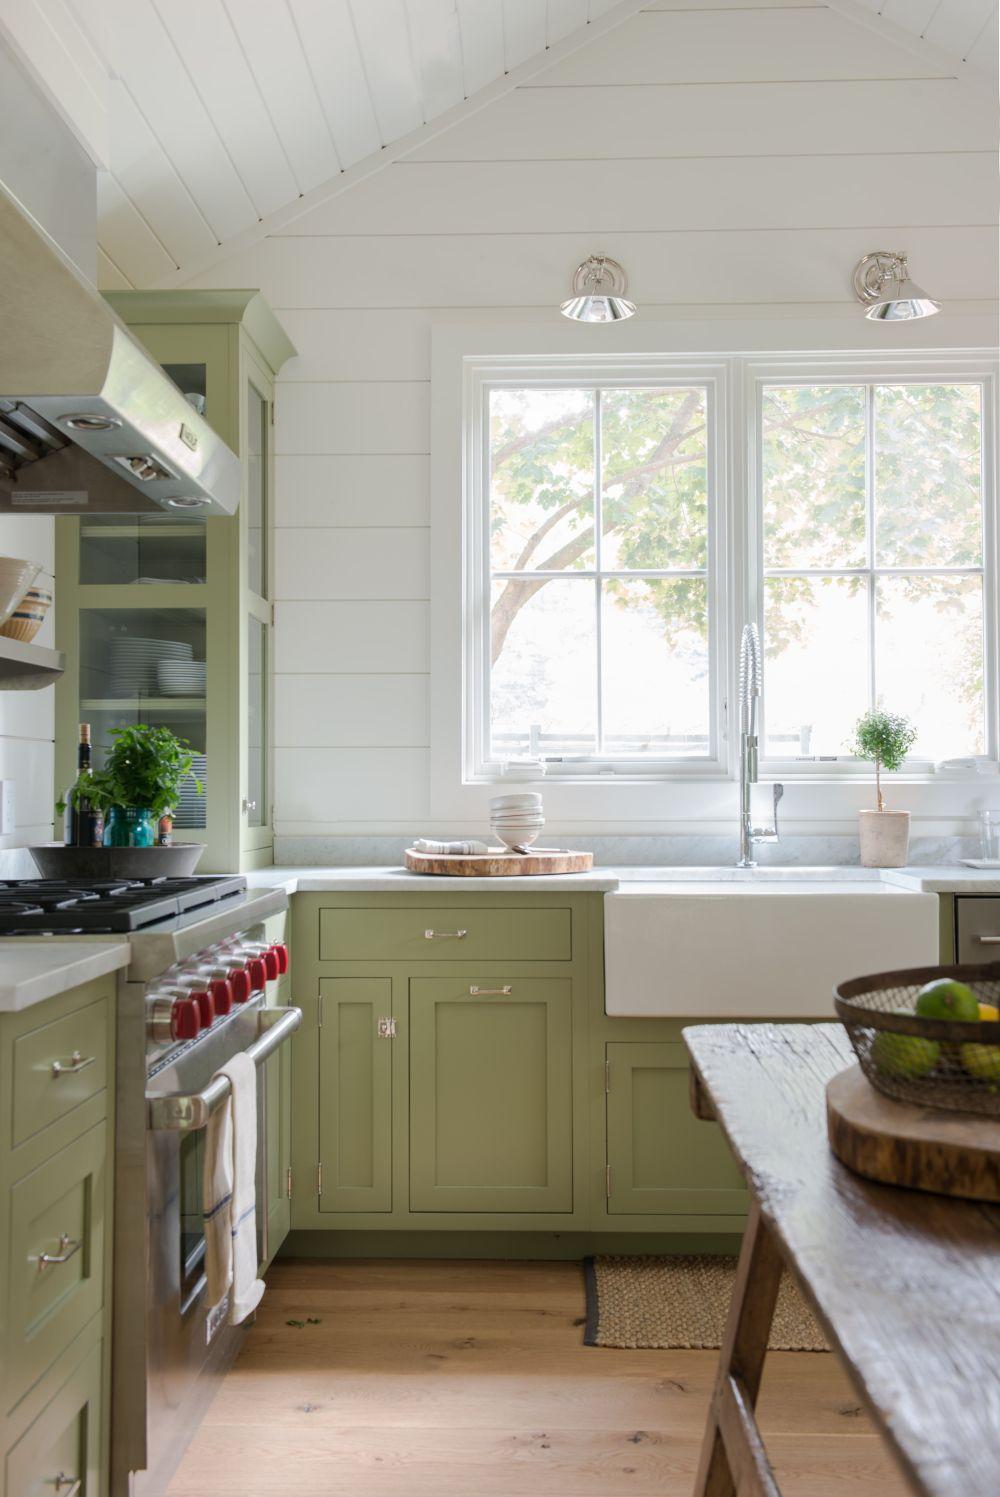 adelaparvu.com despre casa din lemn cu interior rustic actual, Design Kelly Mittleman, arch Mark Finlay, Foto Jane Beiles (10)